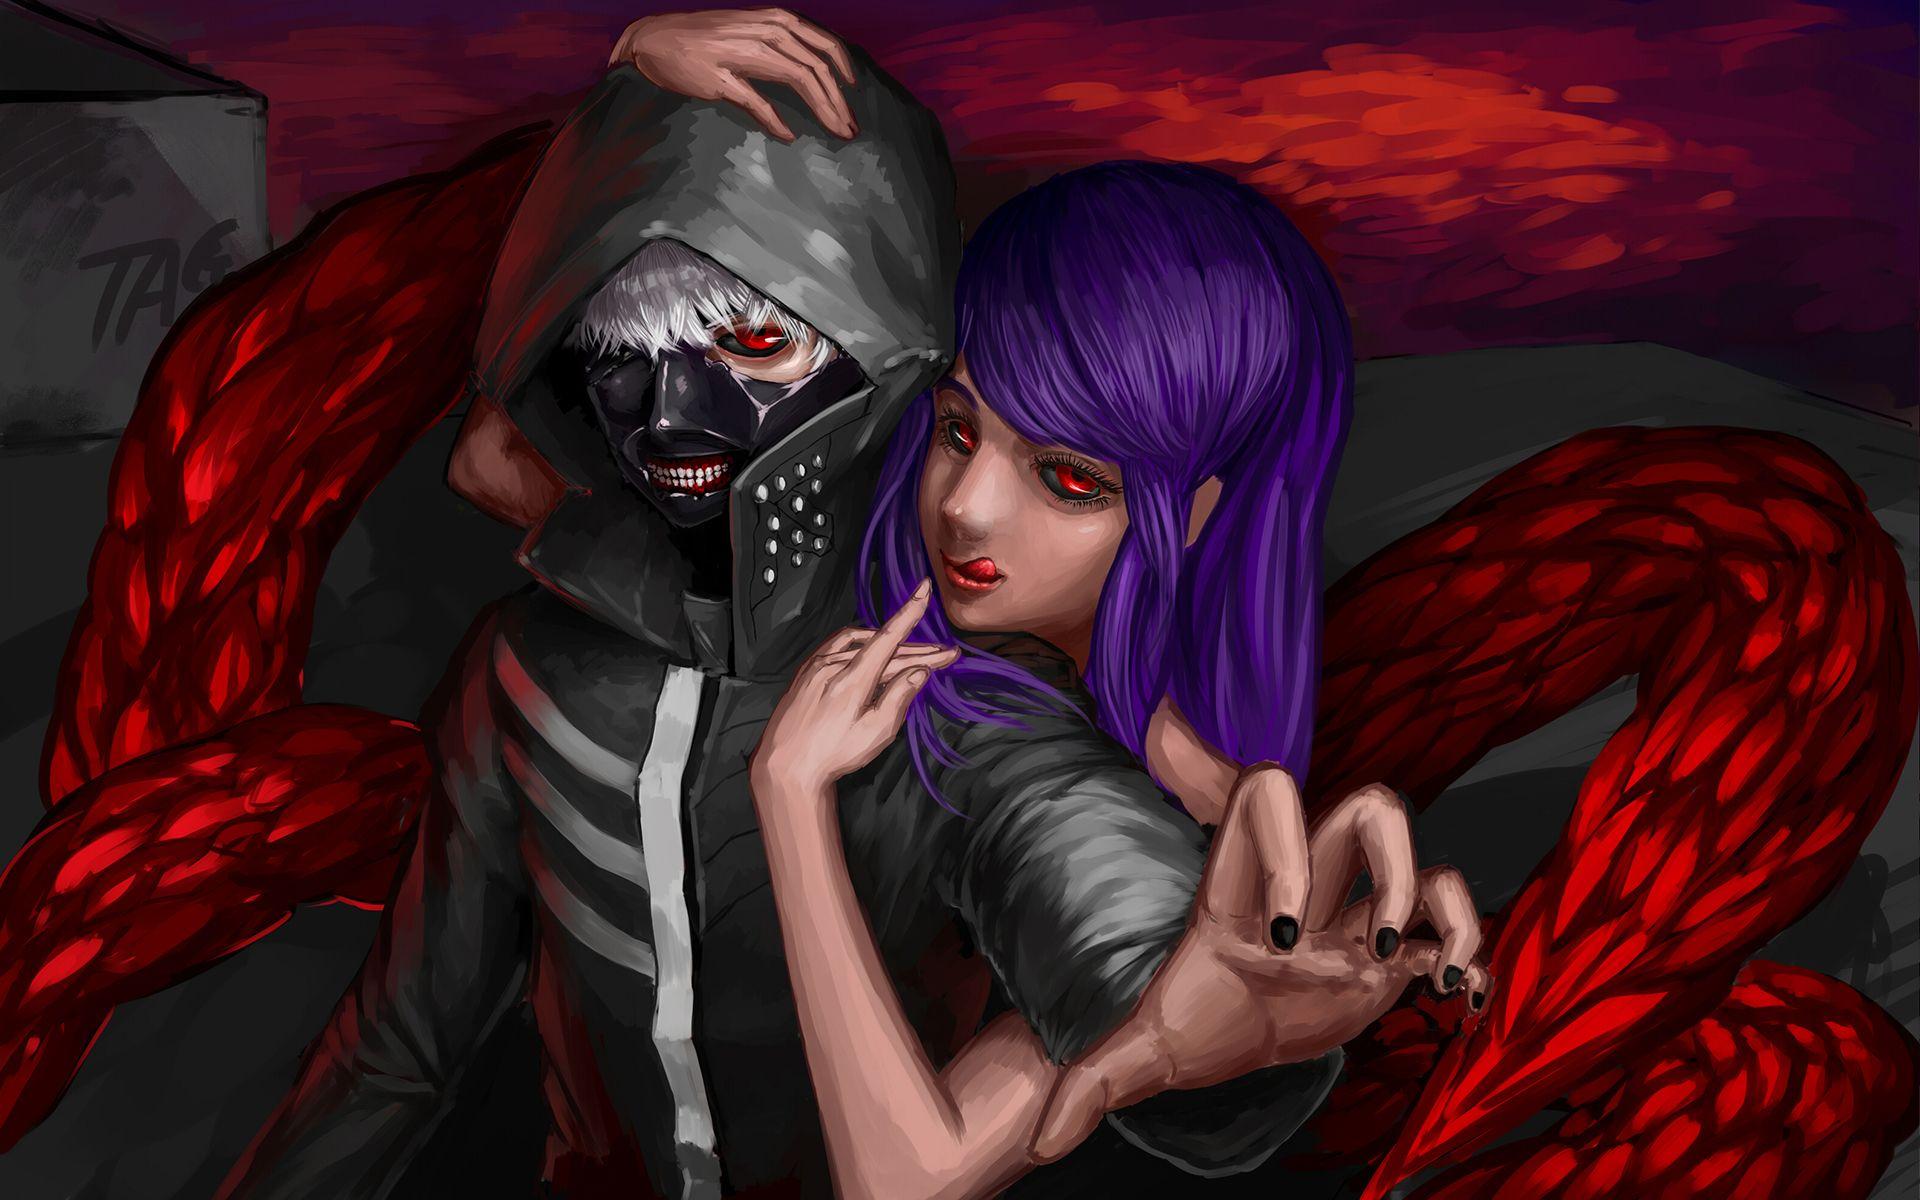 Pin en Anime/Manga Heroes/Villains